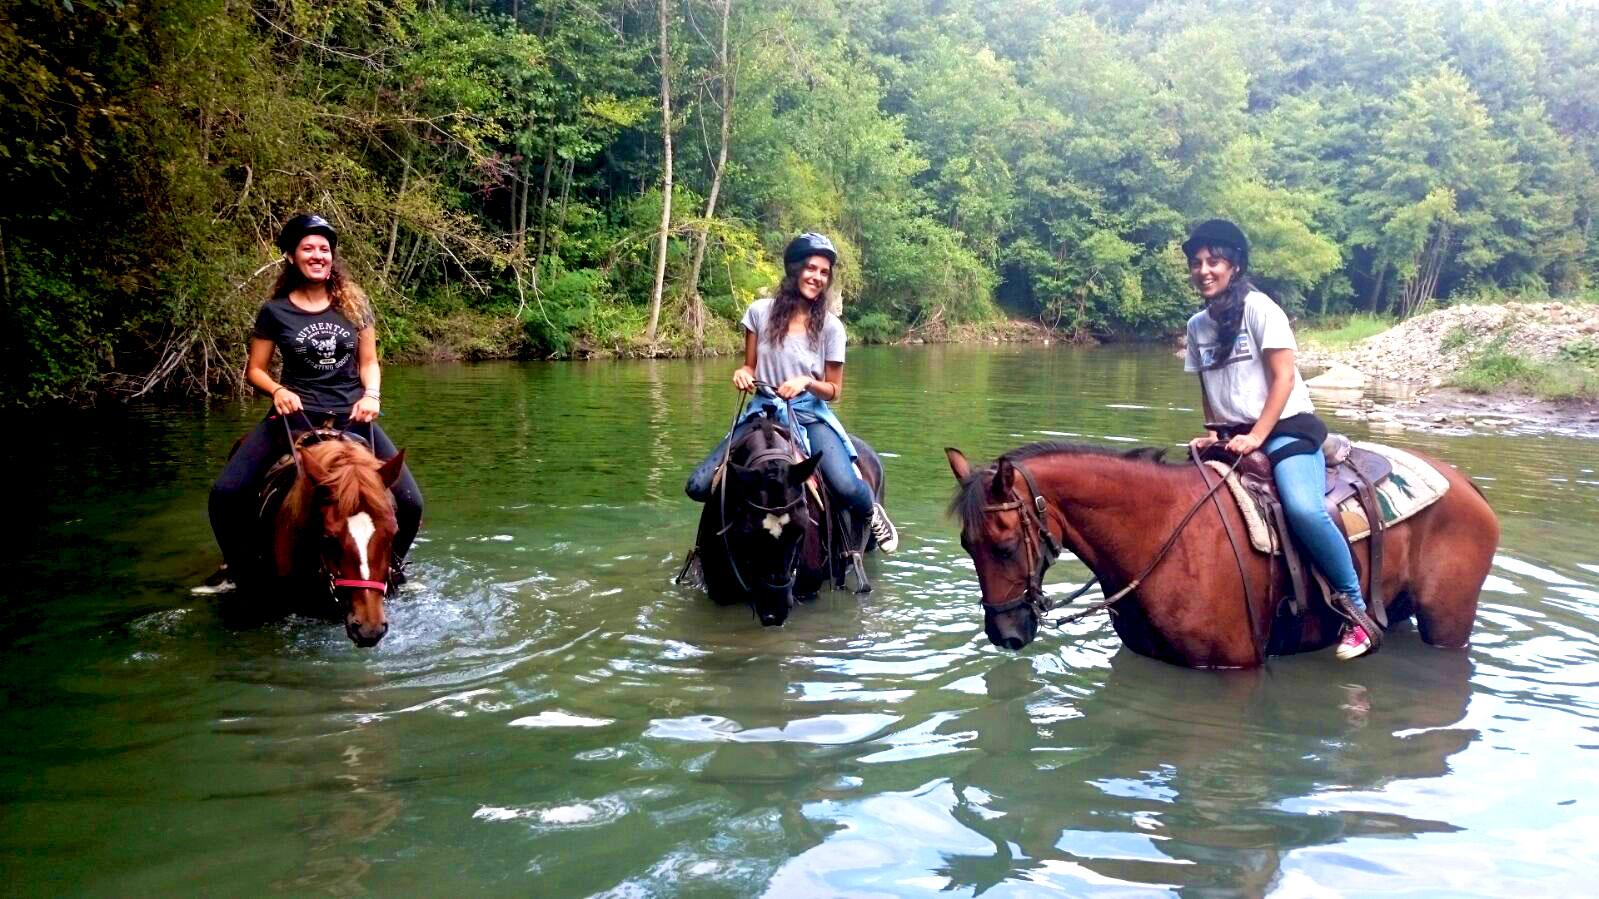 attraversamento torrente a cavallo